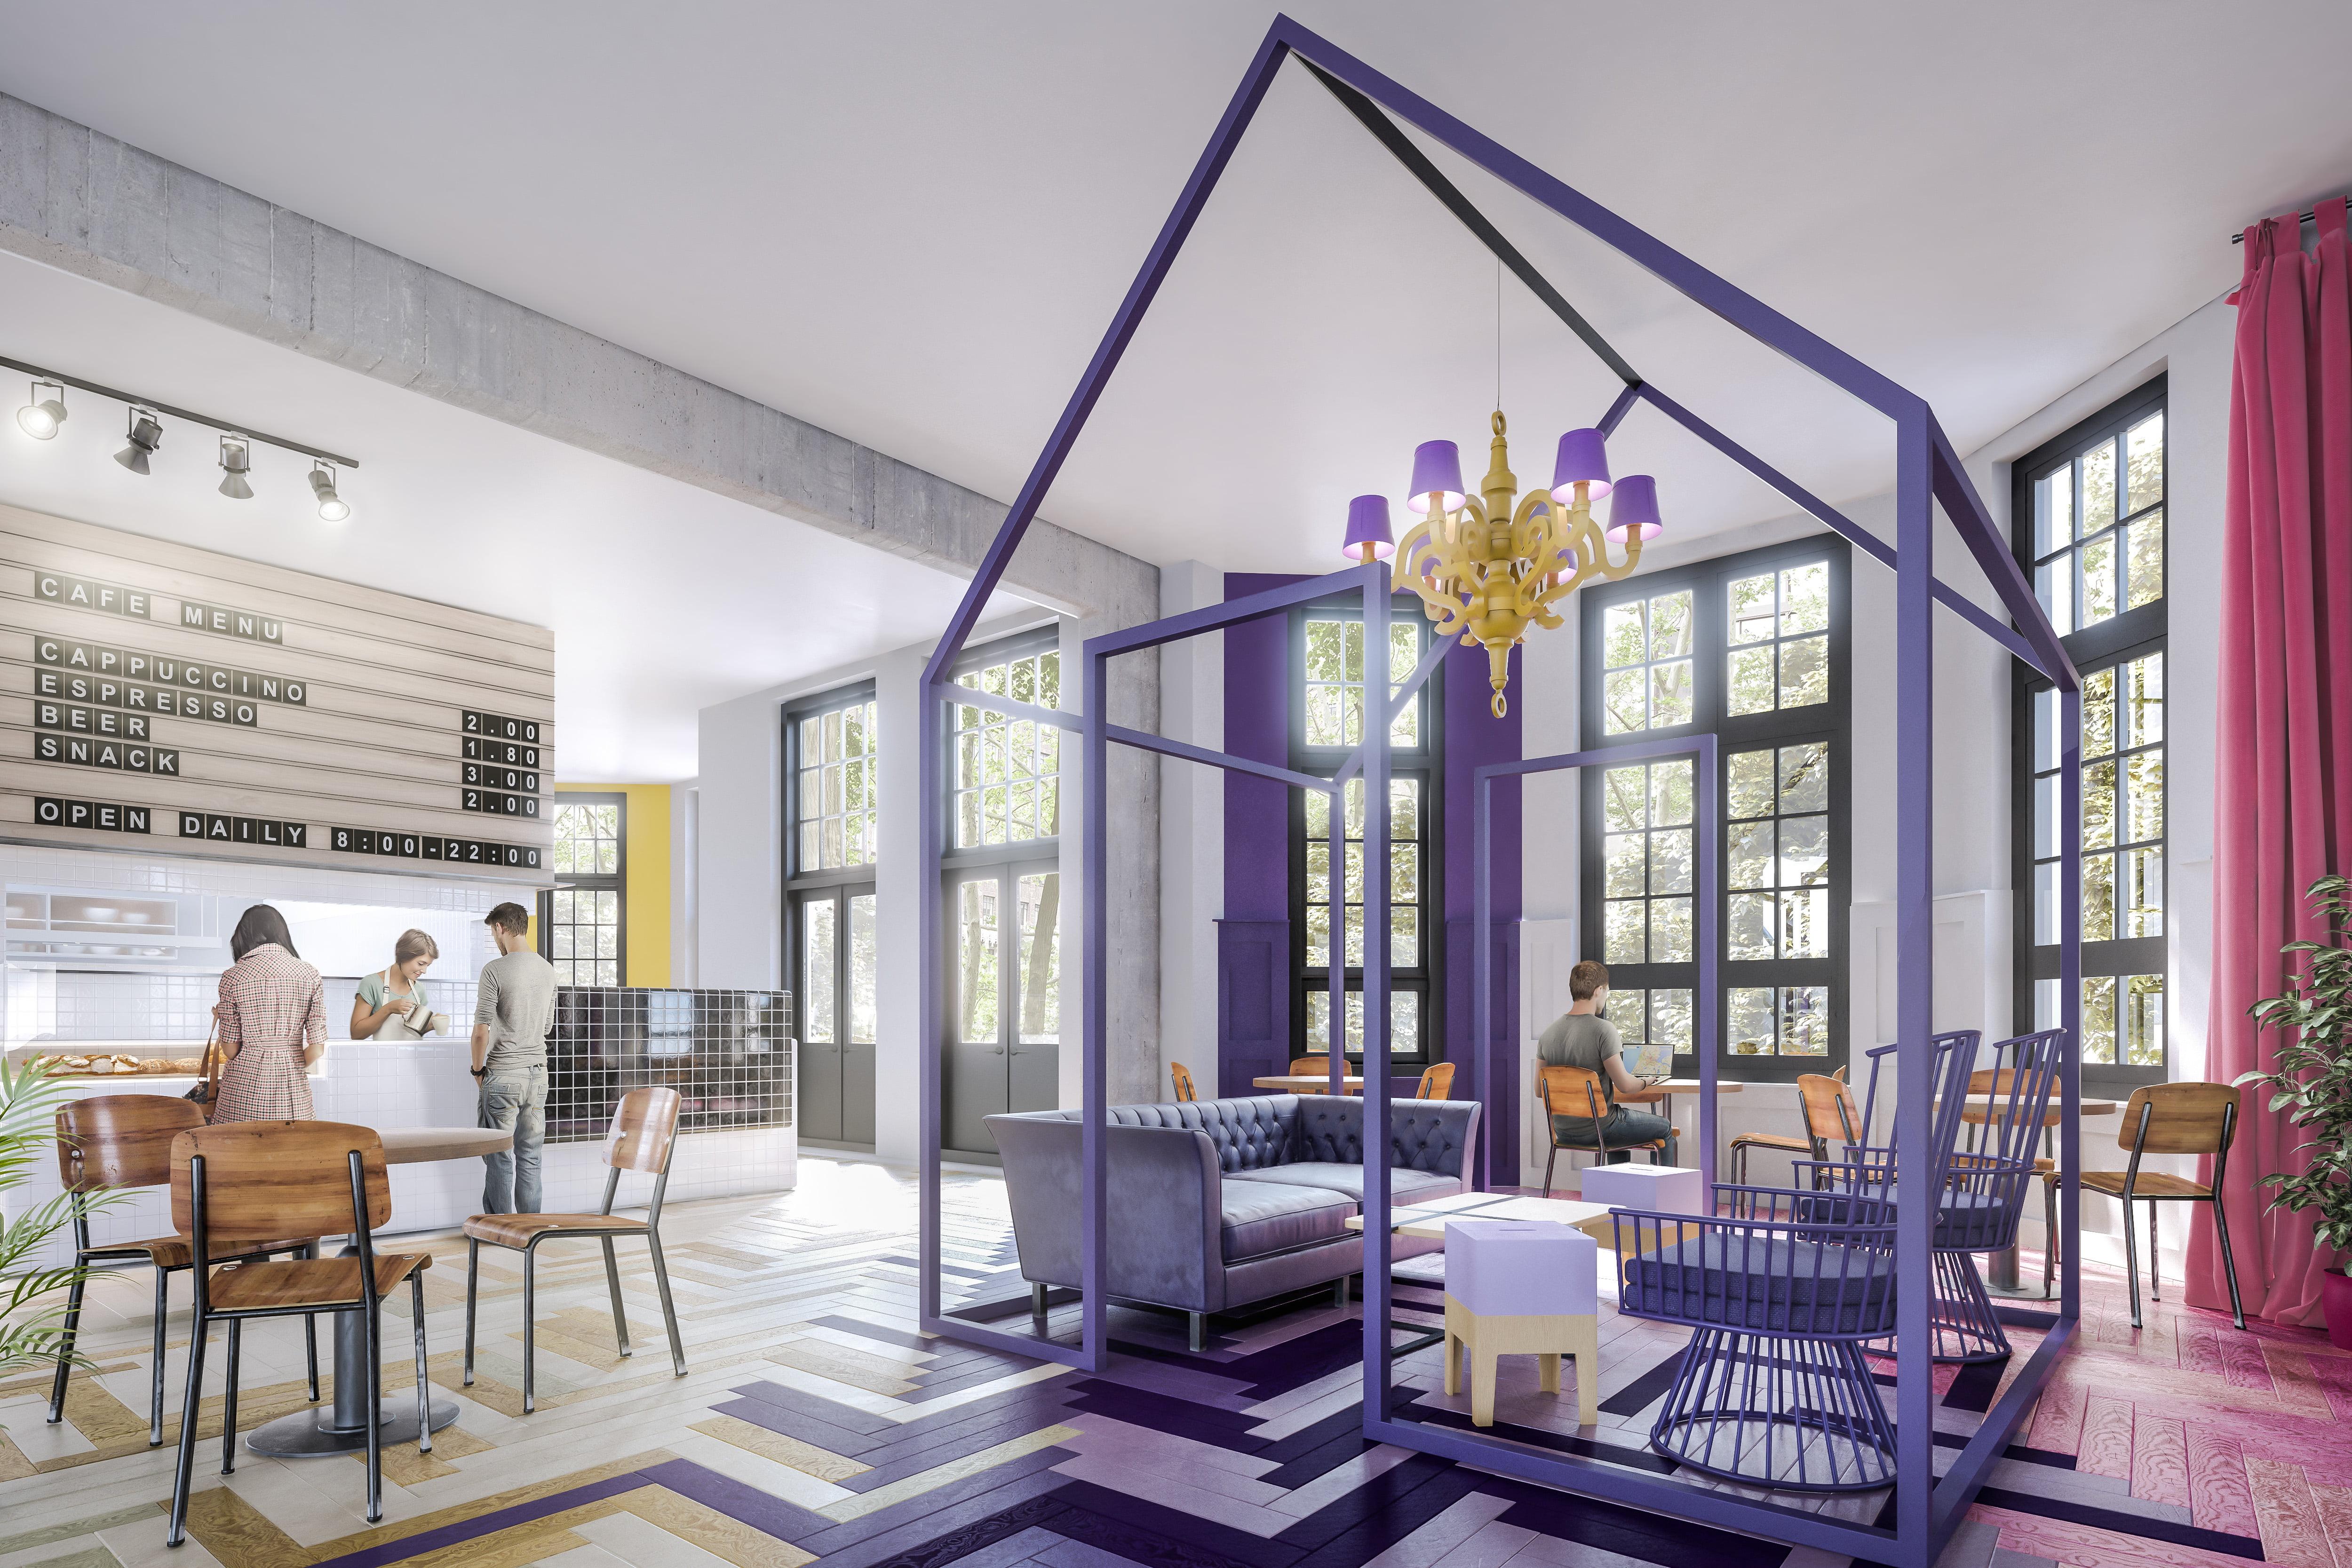 Design led generator hostels expands in europe space for Interior design online generator